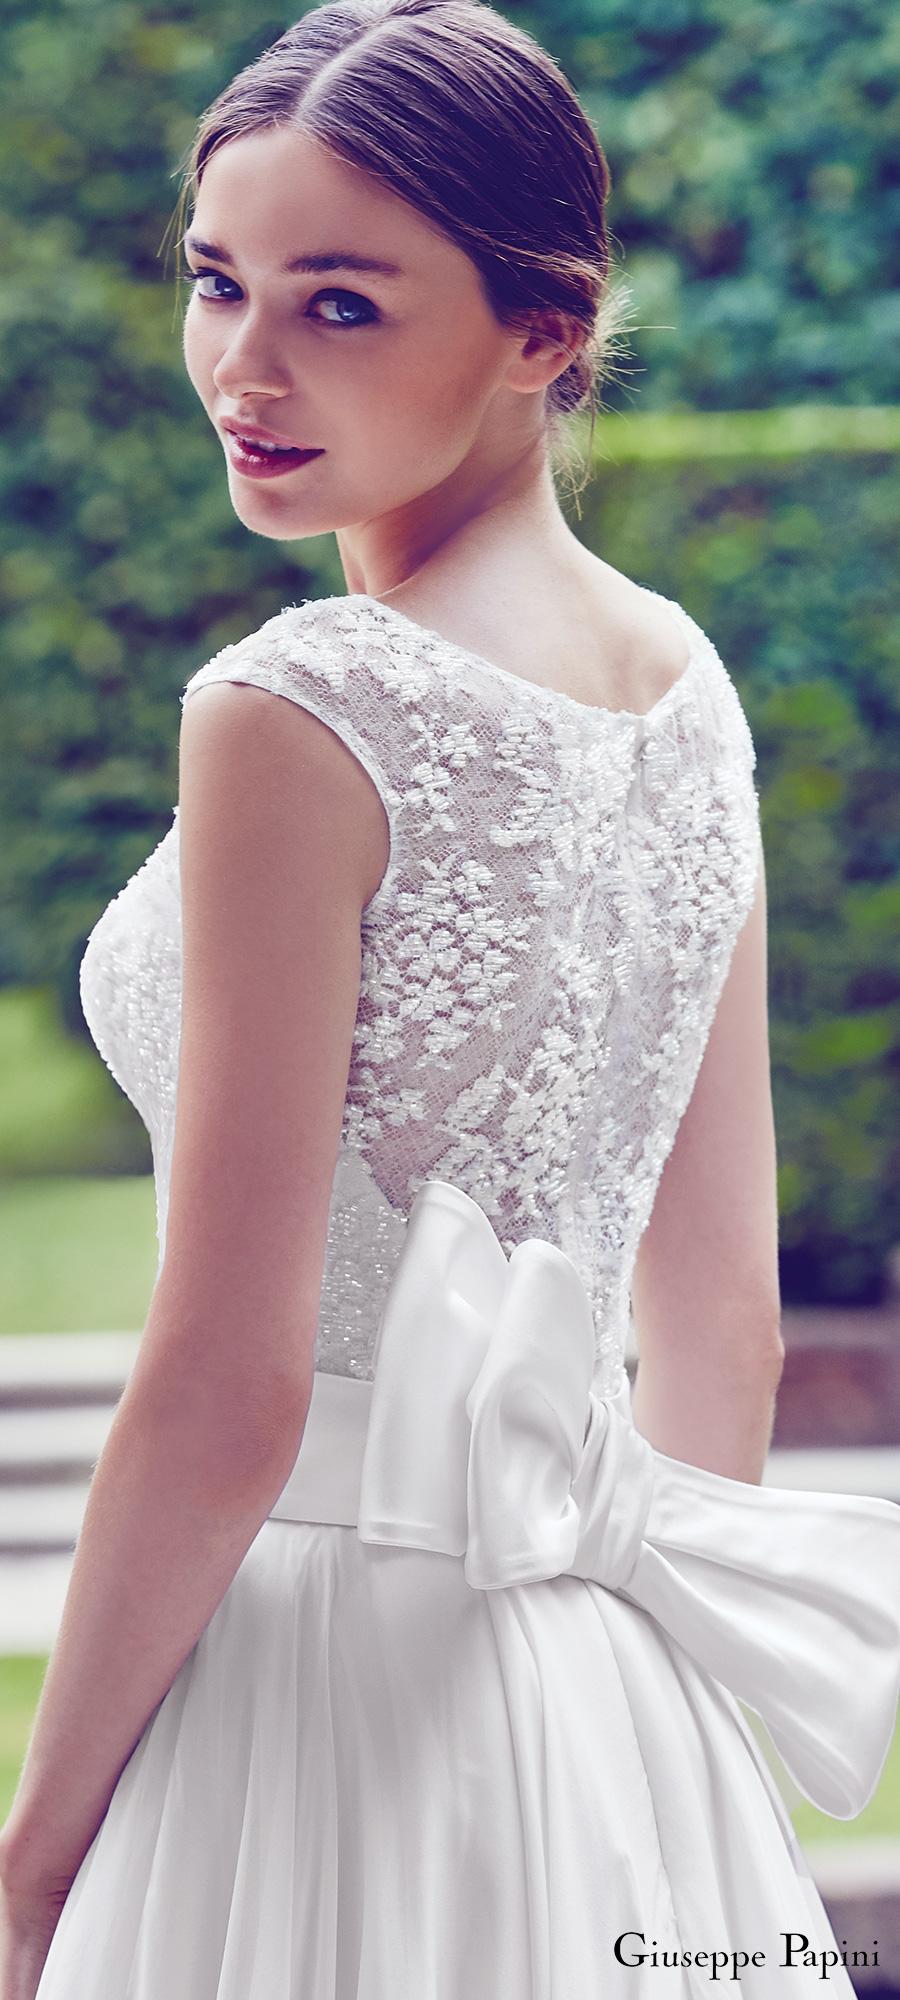 giuseppe papini 2017 (portofino) cap sleeve illusion back a line wedding dress bv romantic bow